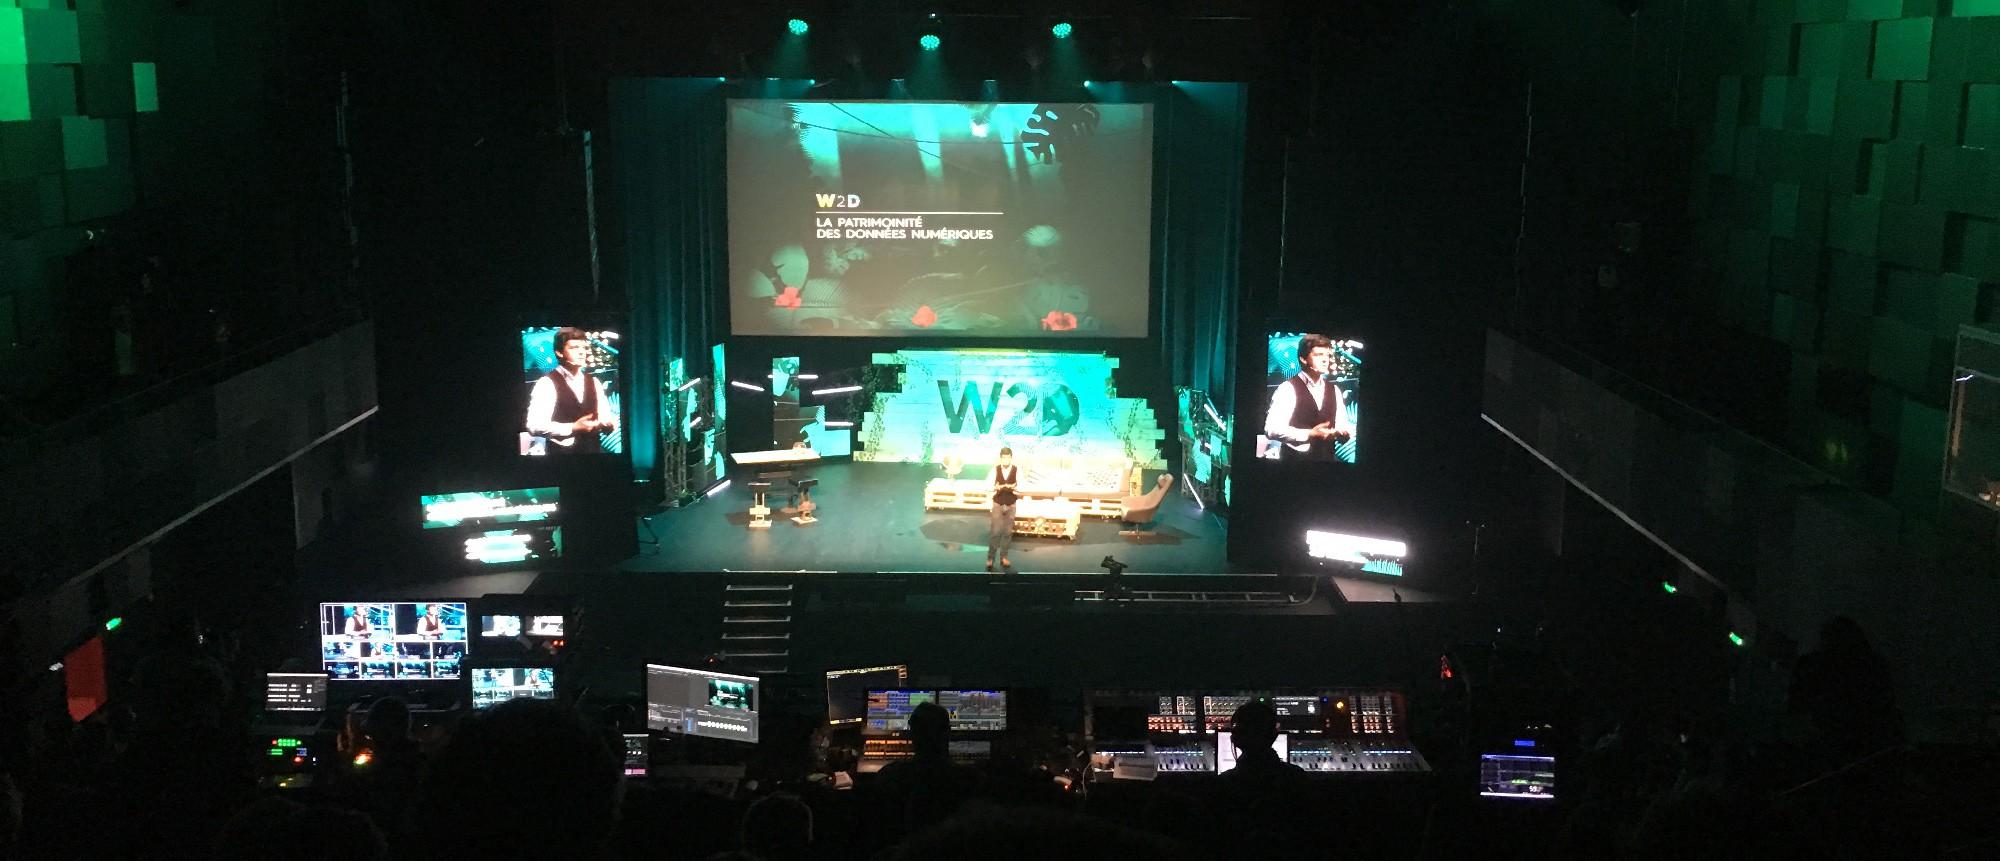 Web2day 2018